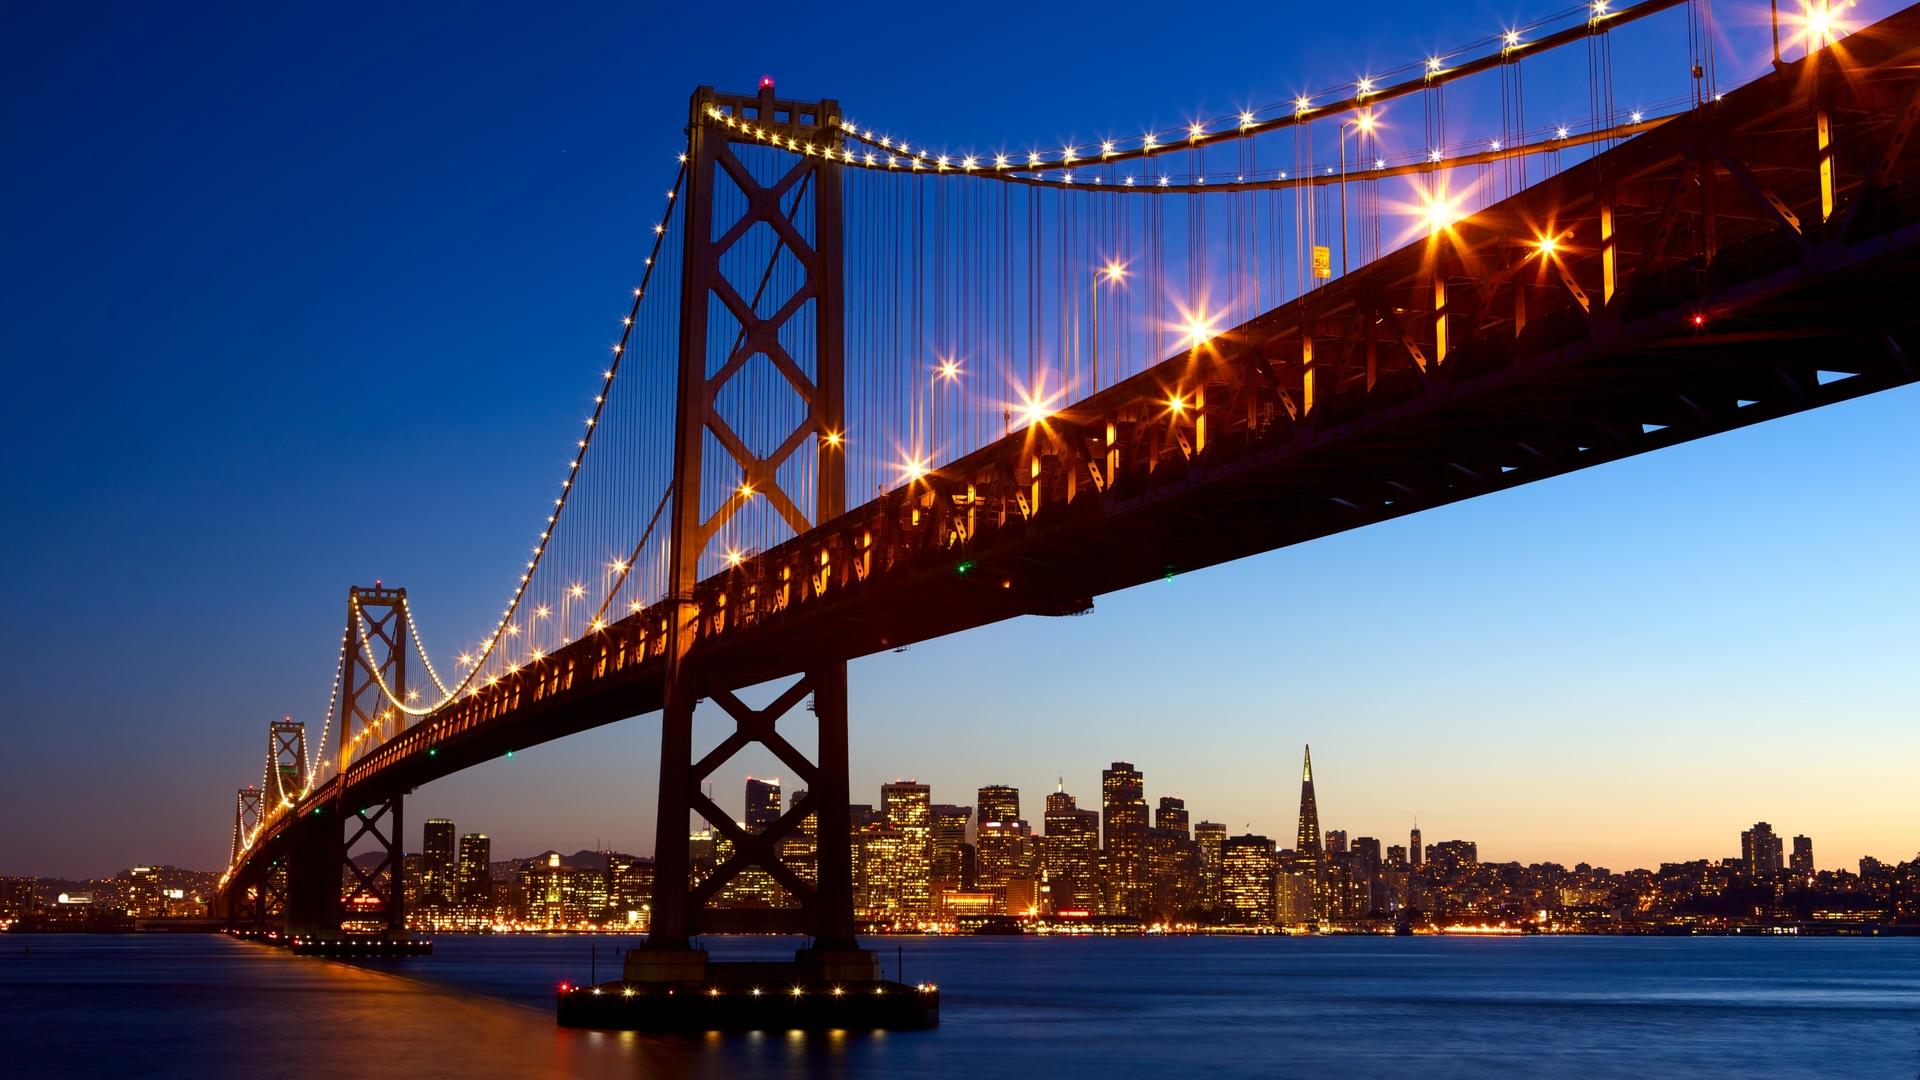 43 San Francisco 4k Wallpaper On Wallpapersafari